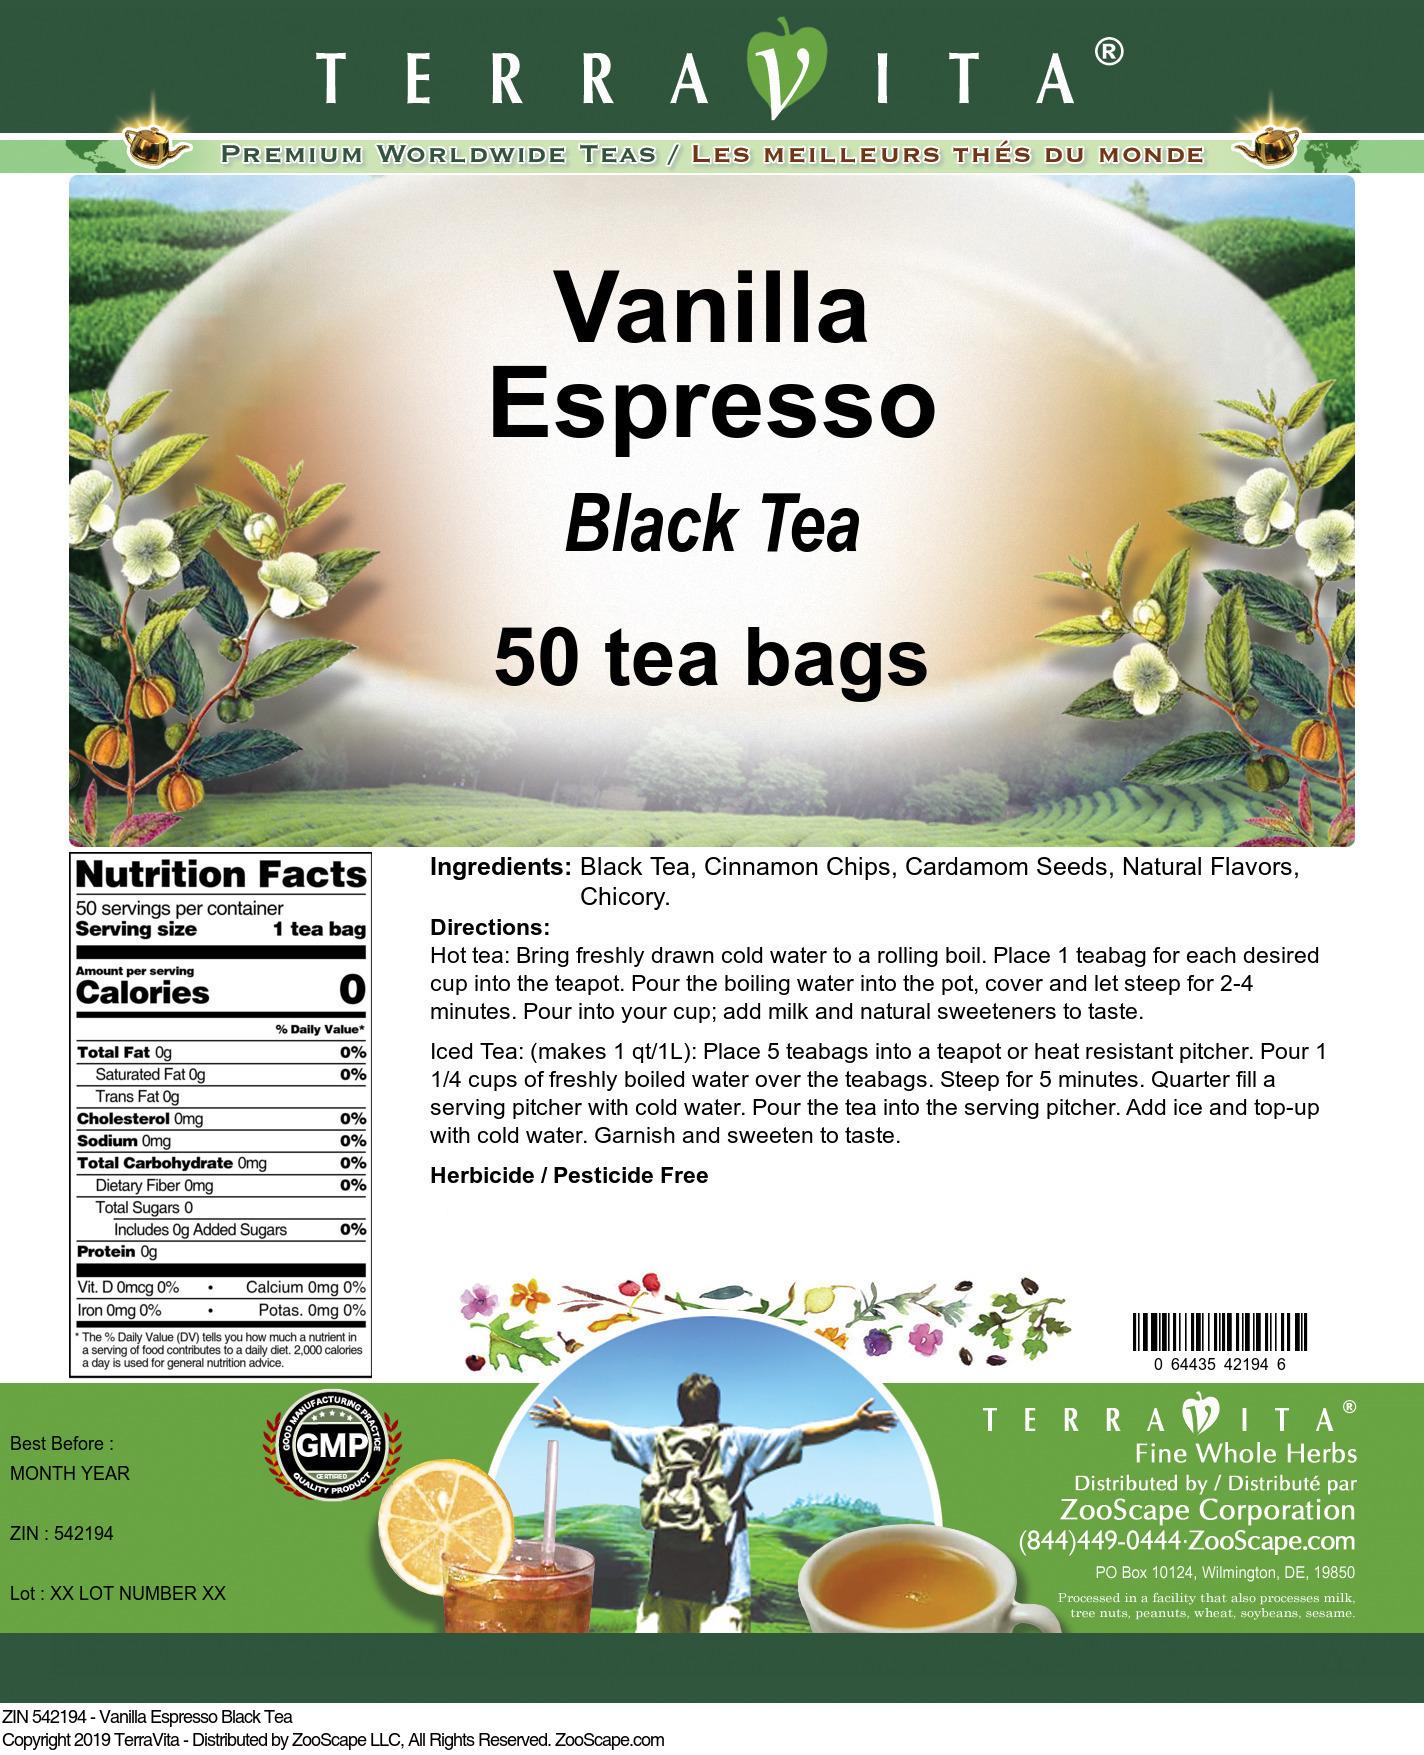 Vanilla Espresso Black Tea